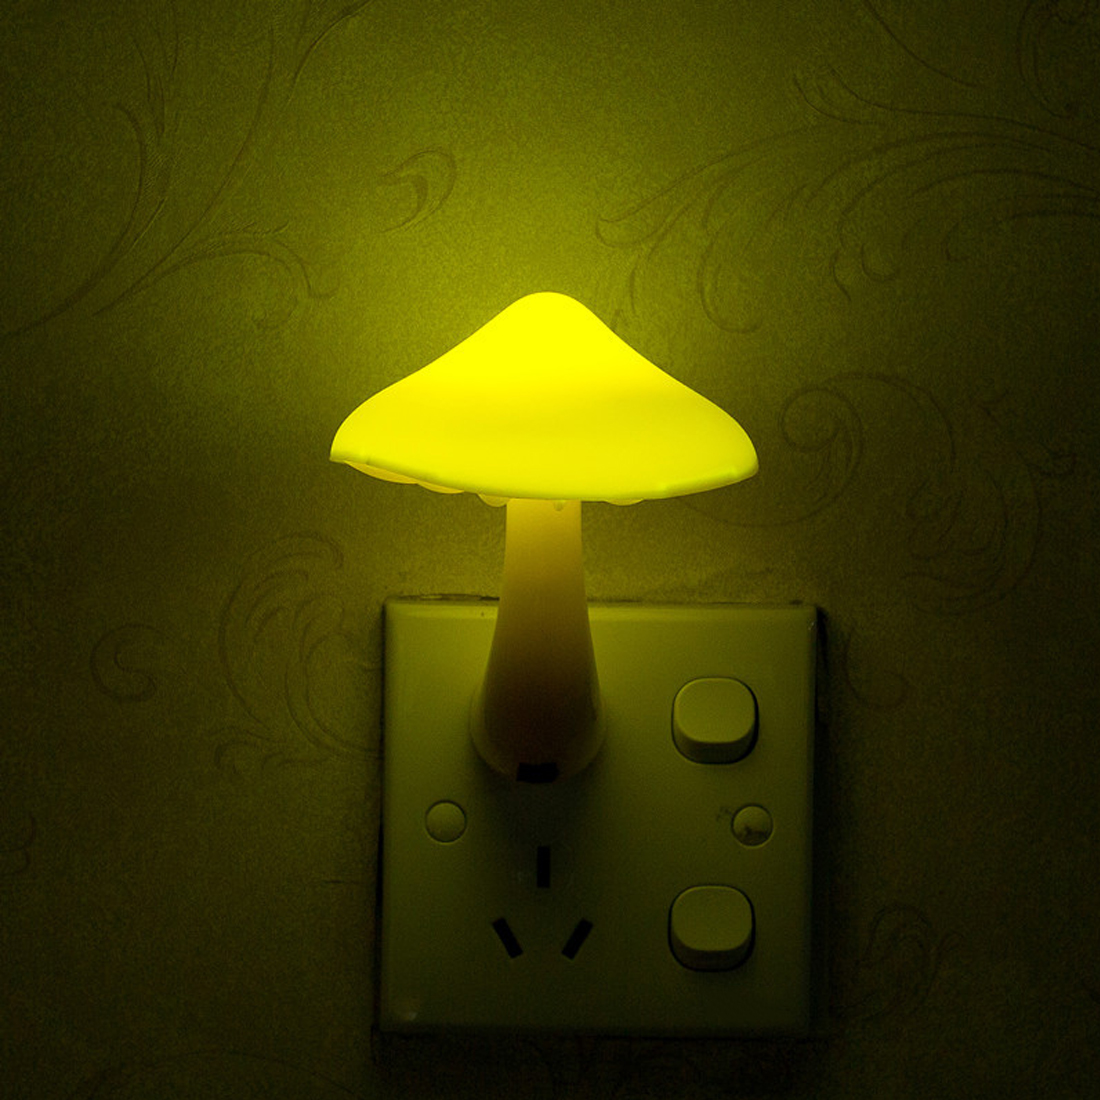 LED Warm Mini Yellow Color Light Mushroom Wall Socket Light Lamp Light-controlled Sensor For Bedroom Home Decoration EU Plug